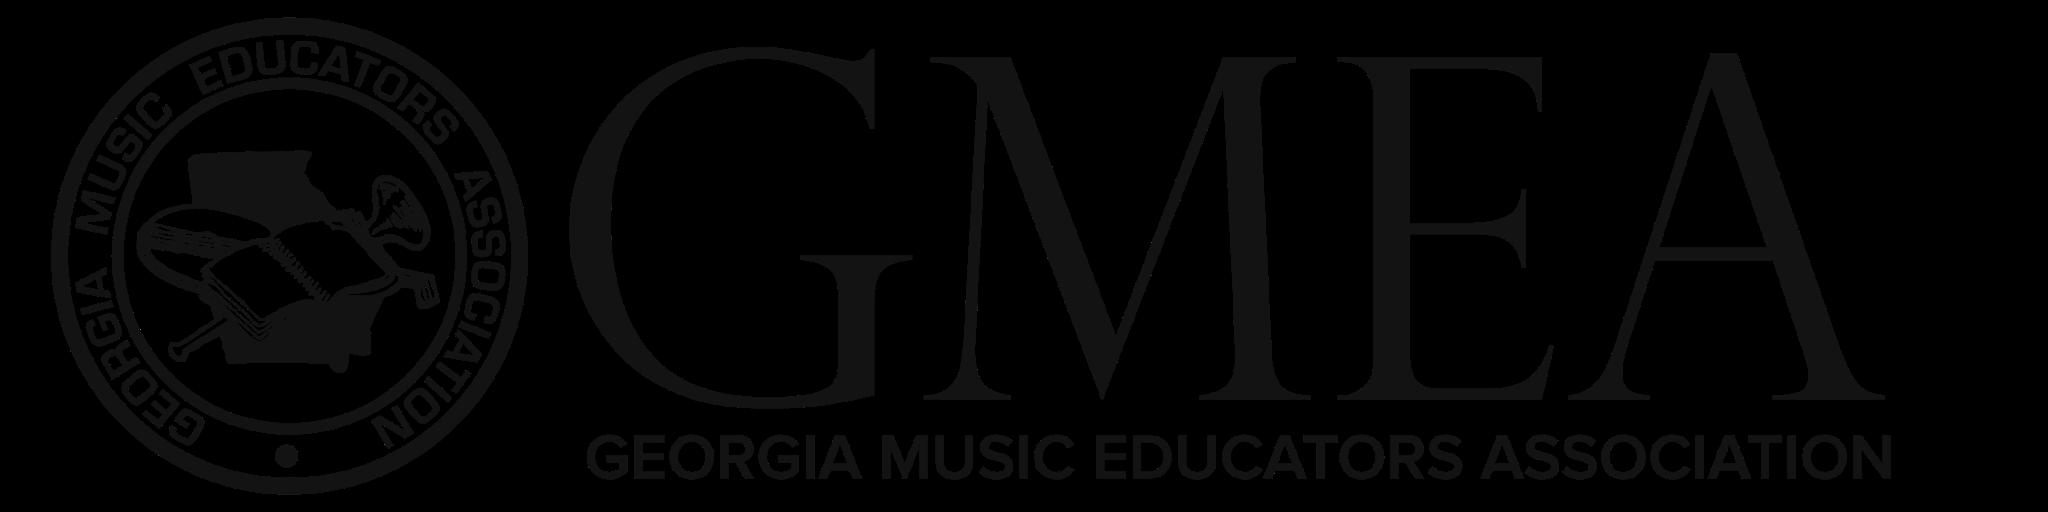 Georgia Music Educators Association In-Service Conference